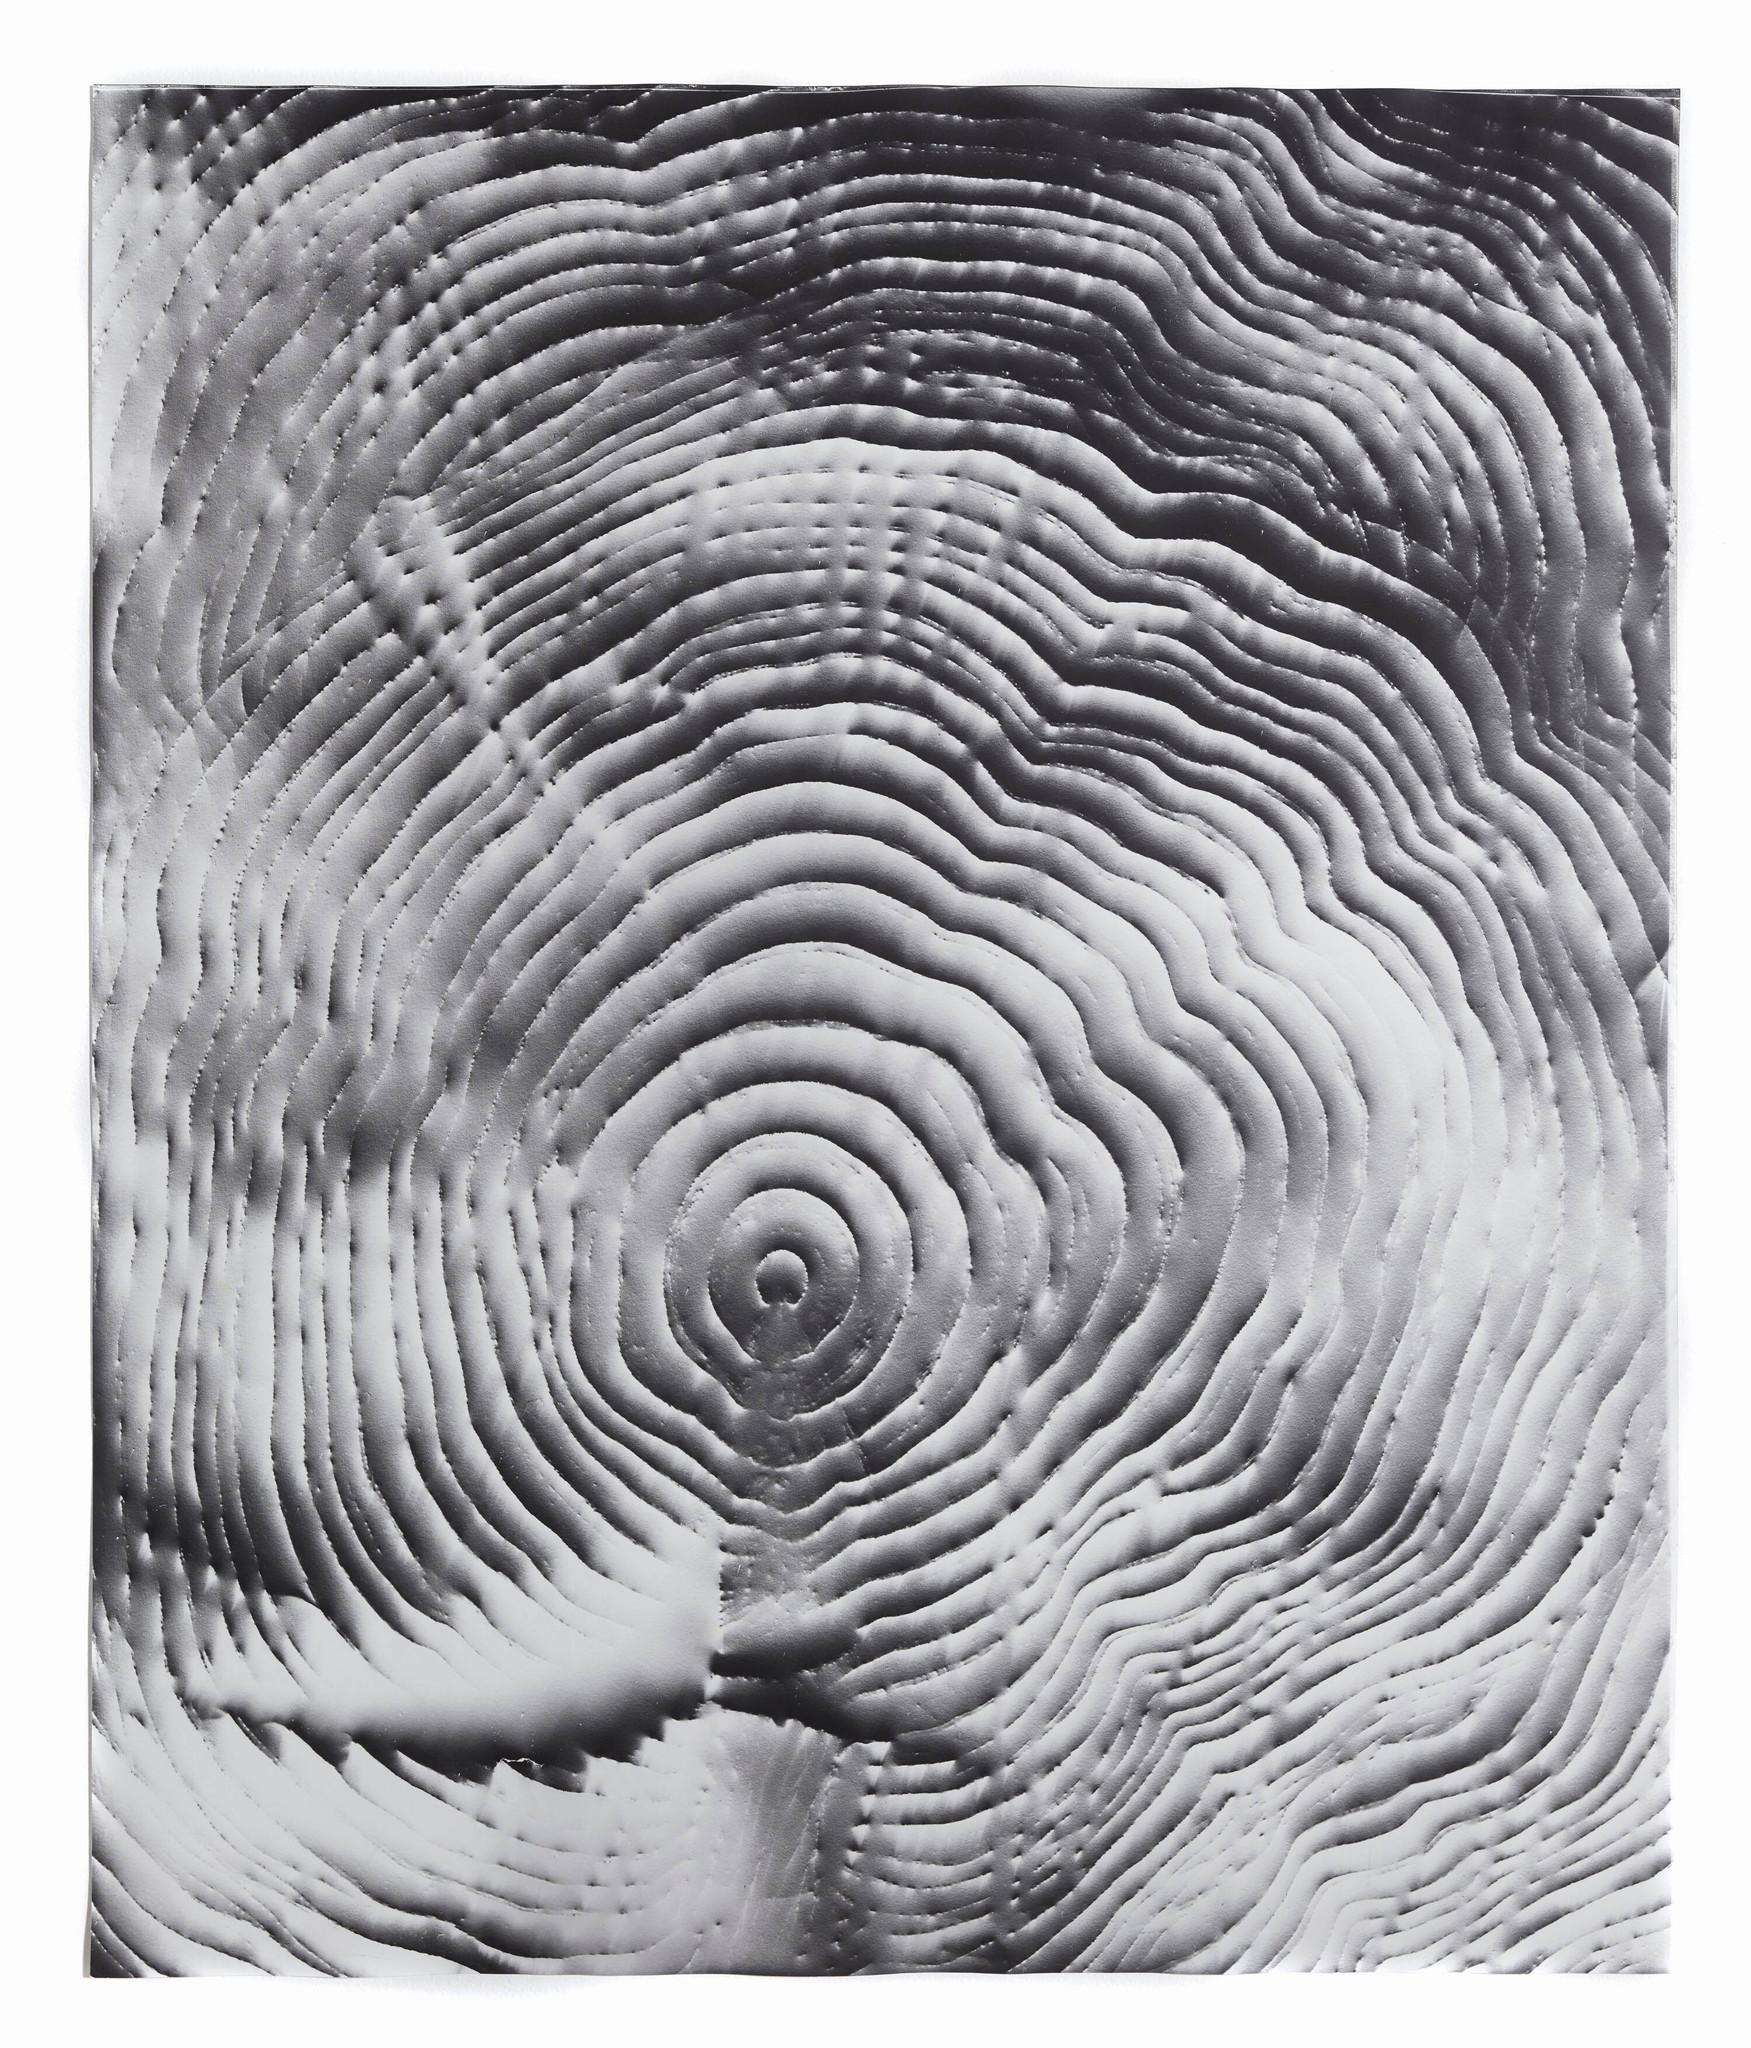 """Automatic Earth #13,"" 2016, photographic rubbing, unique gelatin silver photogram."